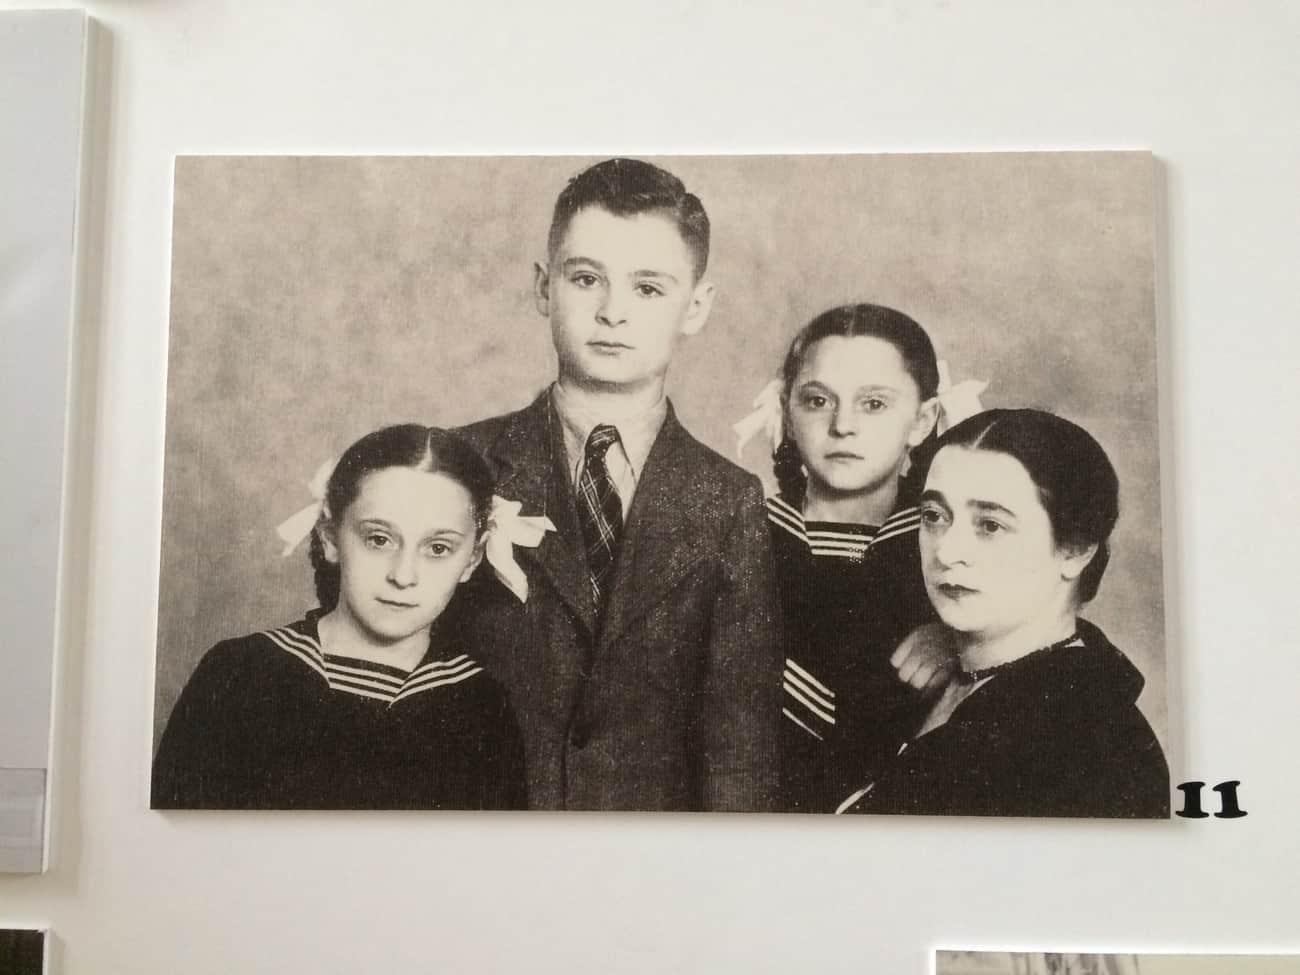 Poland Krakow Jewish History Exhibition Allerhand Family